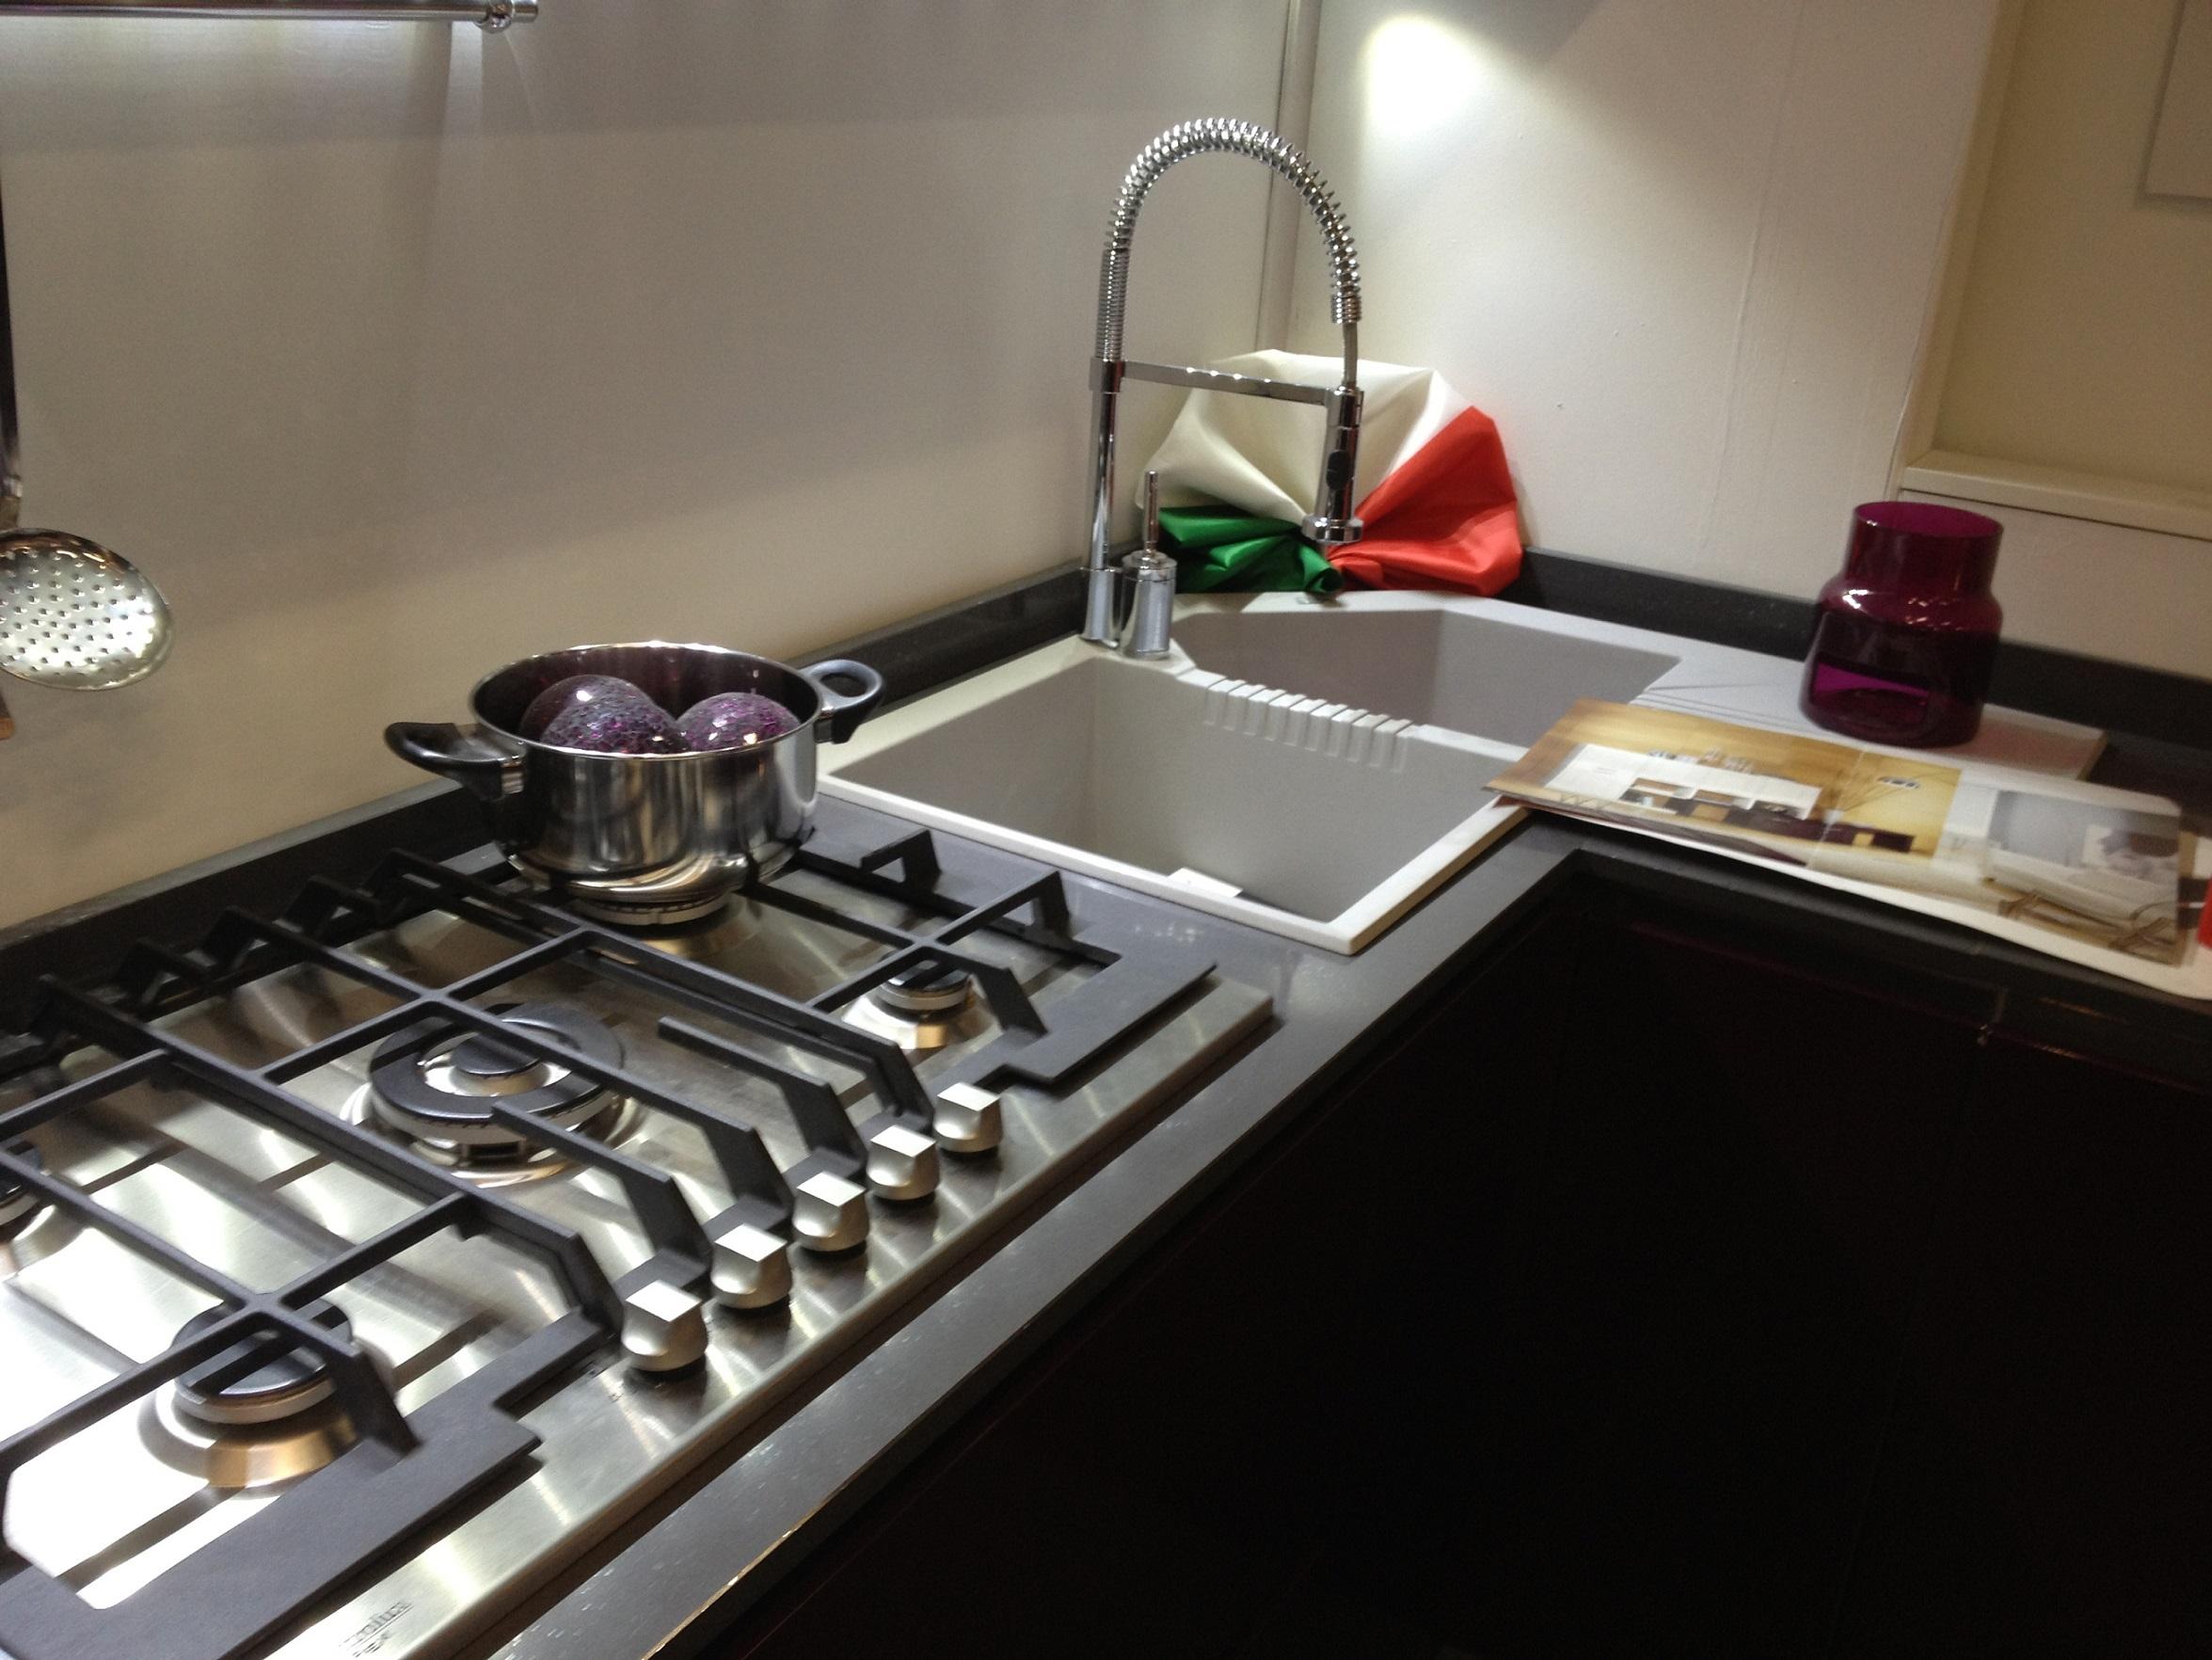 Stunning Costo Top Cucina Ideas - bery.us - bery.us